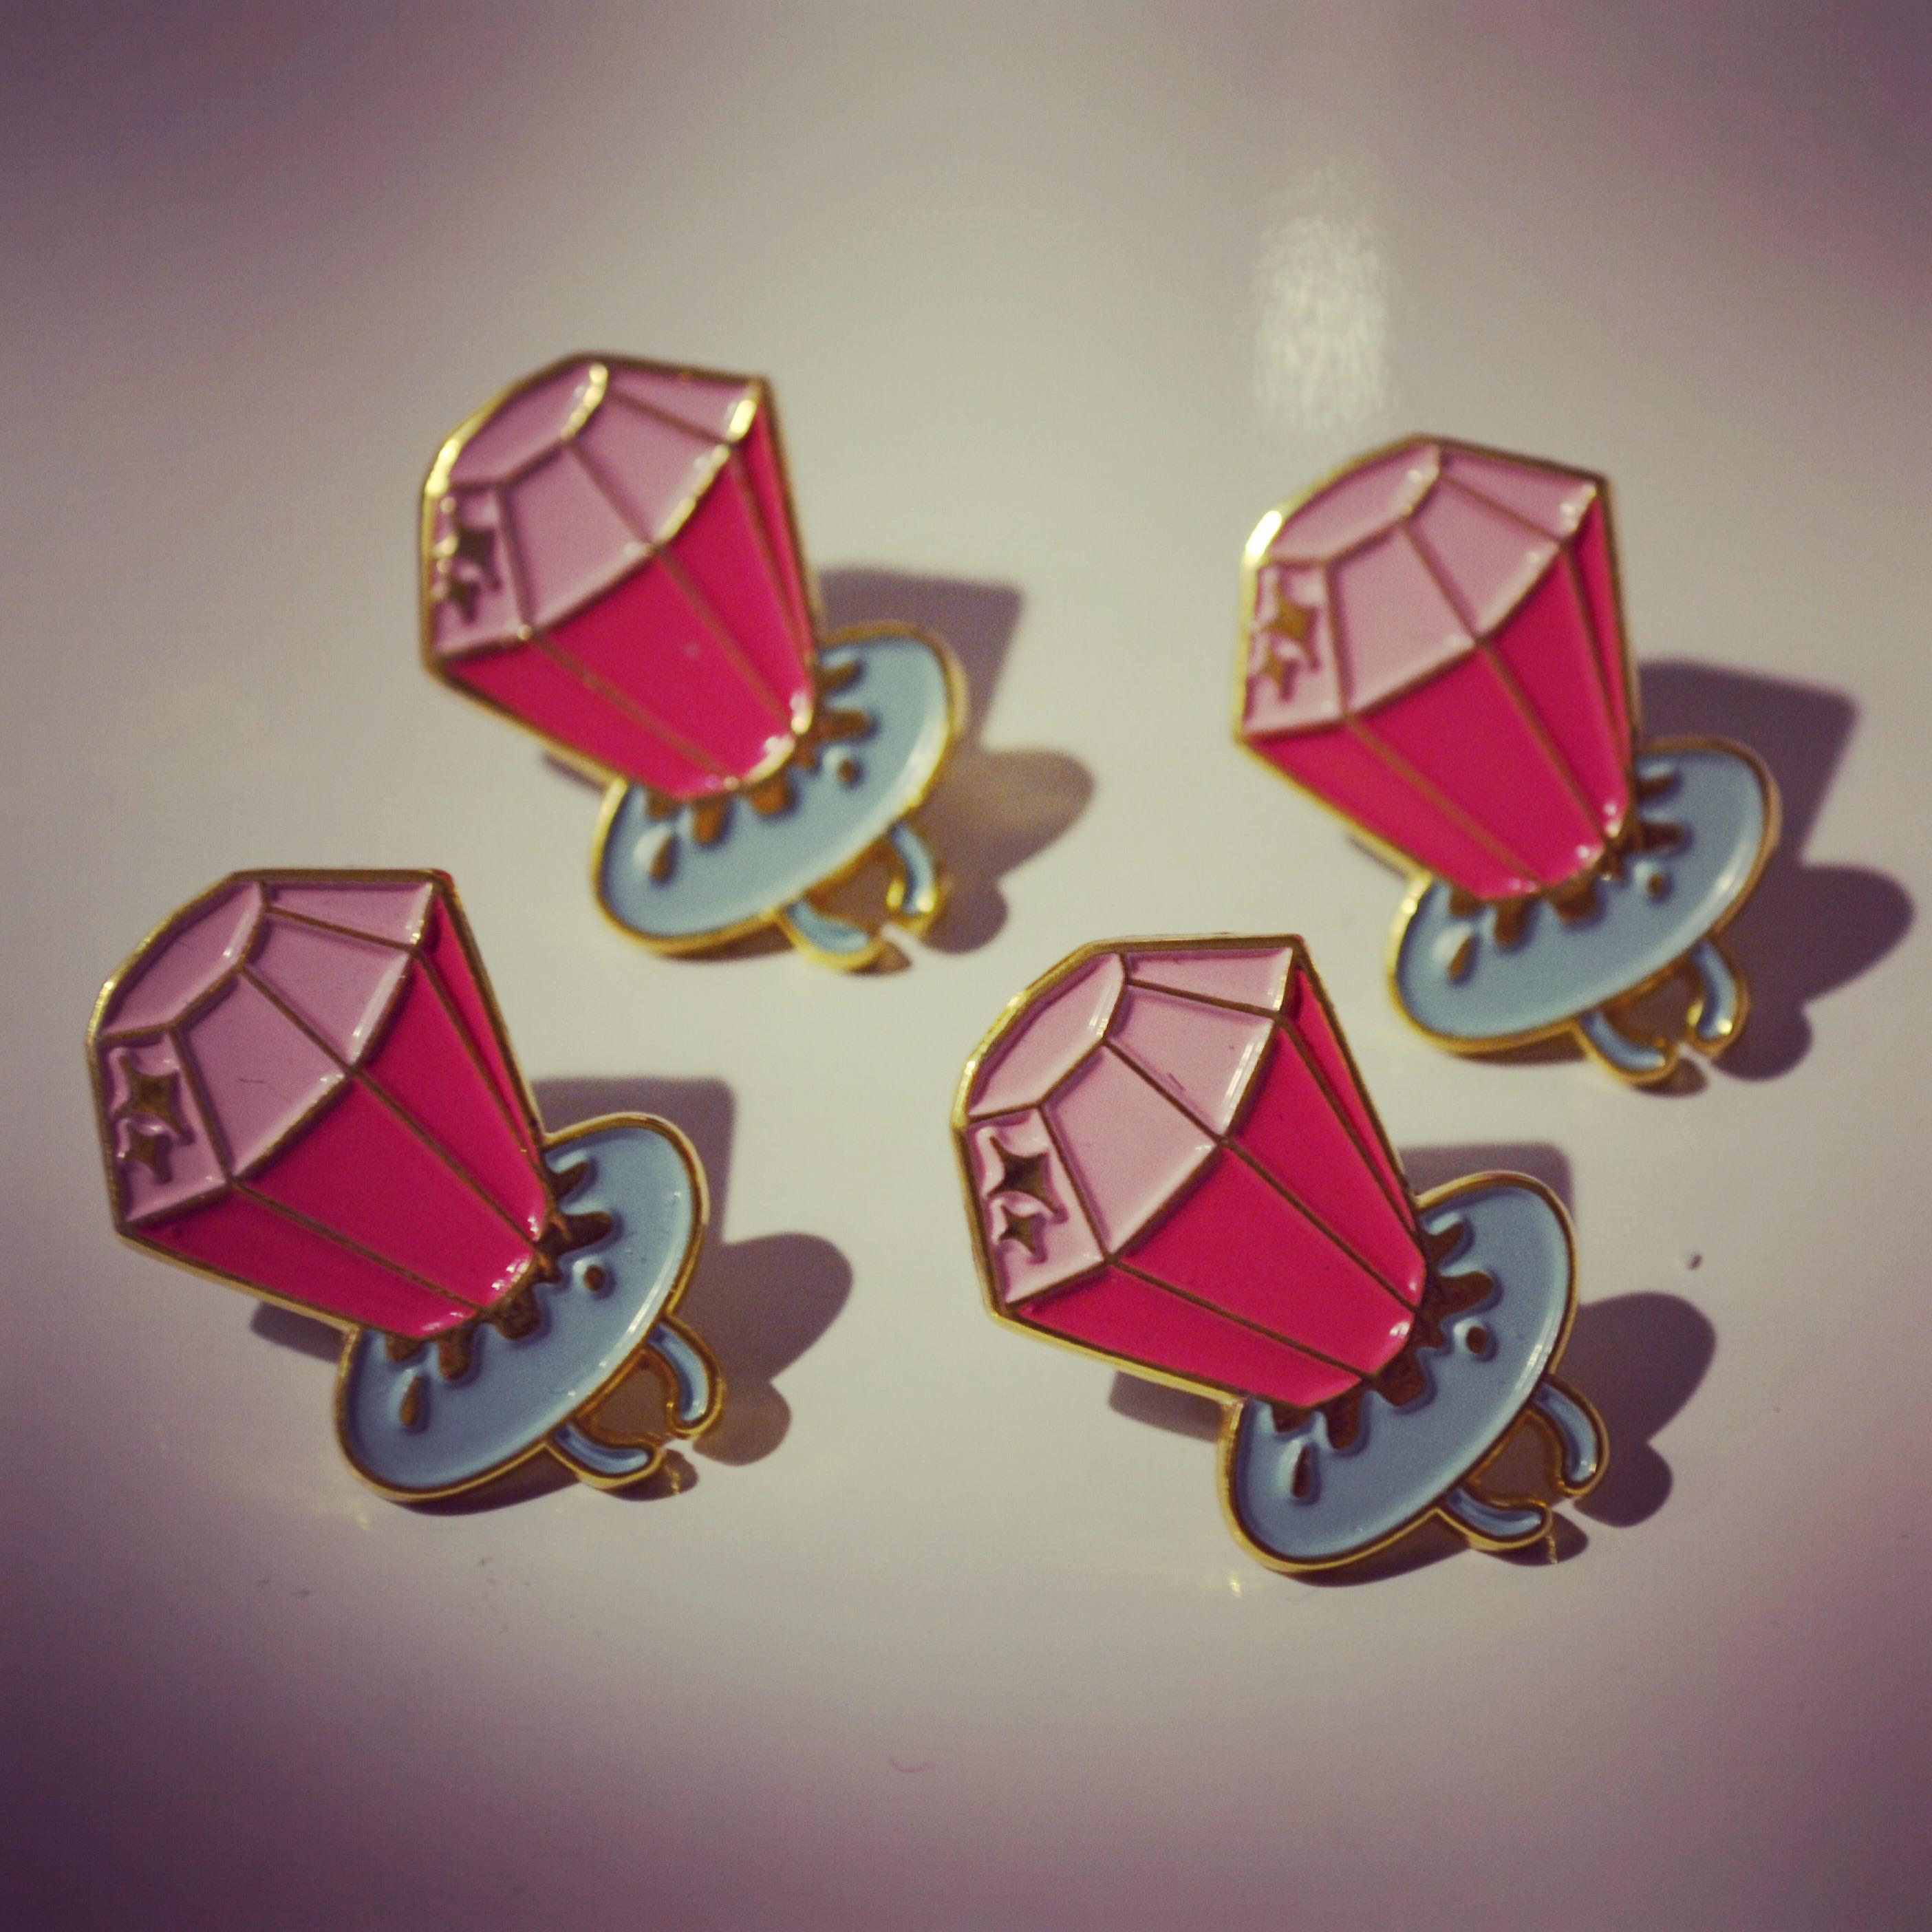 f228b9e596 Ringpop Pin · Sick Girls · Online Store Powered by Storenvy